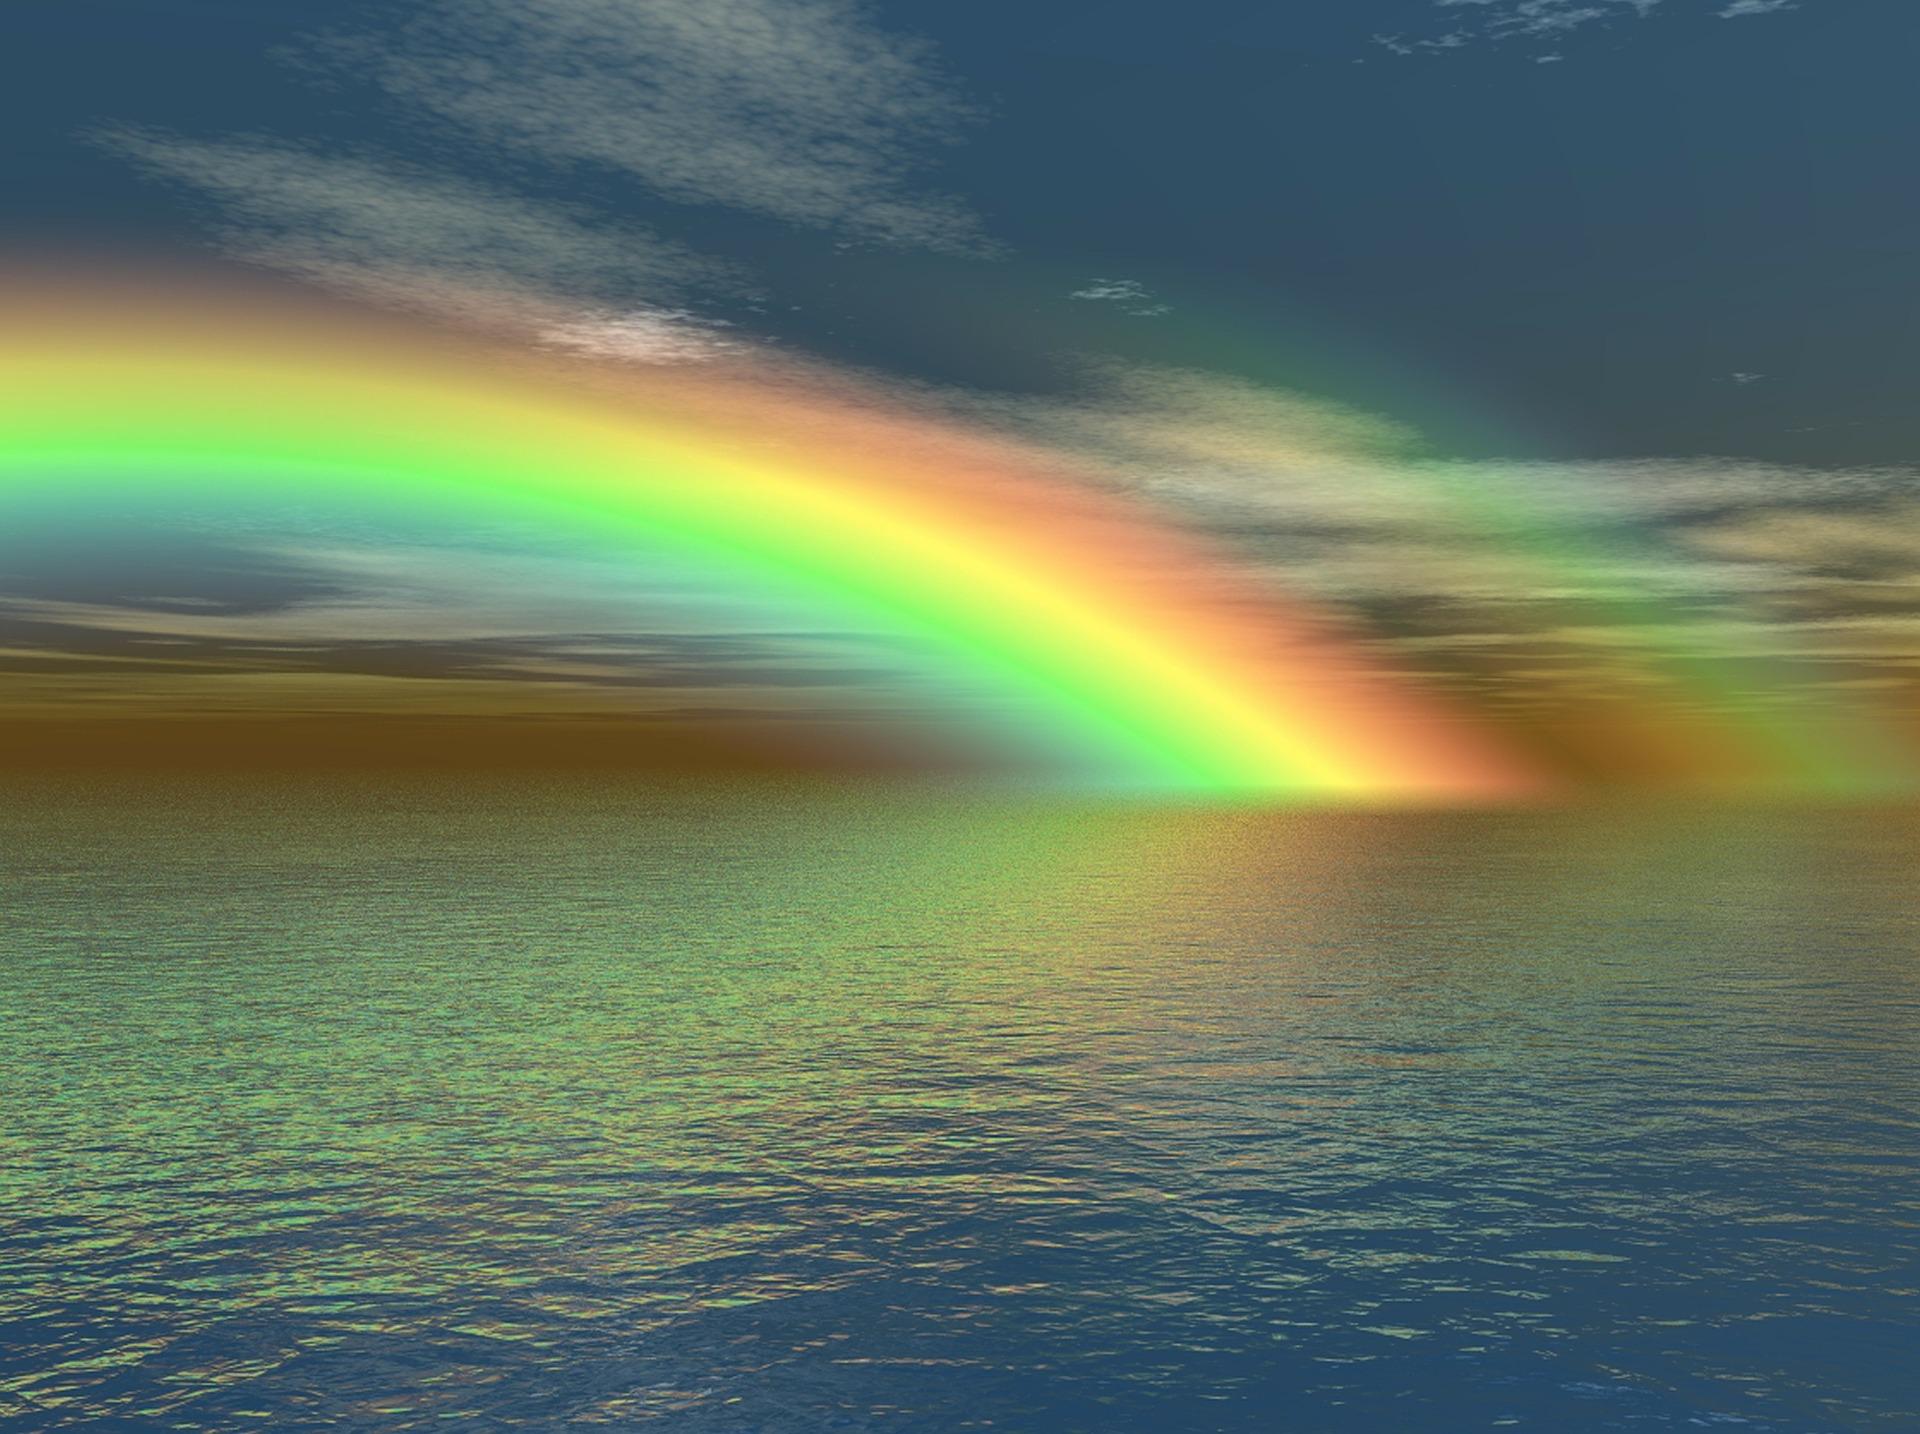 Br cken bauen regenbogen - Foto di animali dell oceano ...